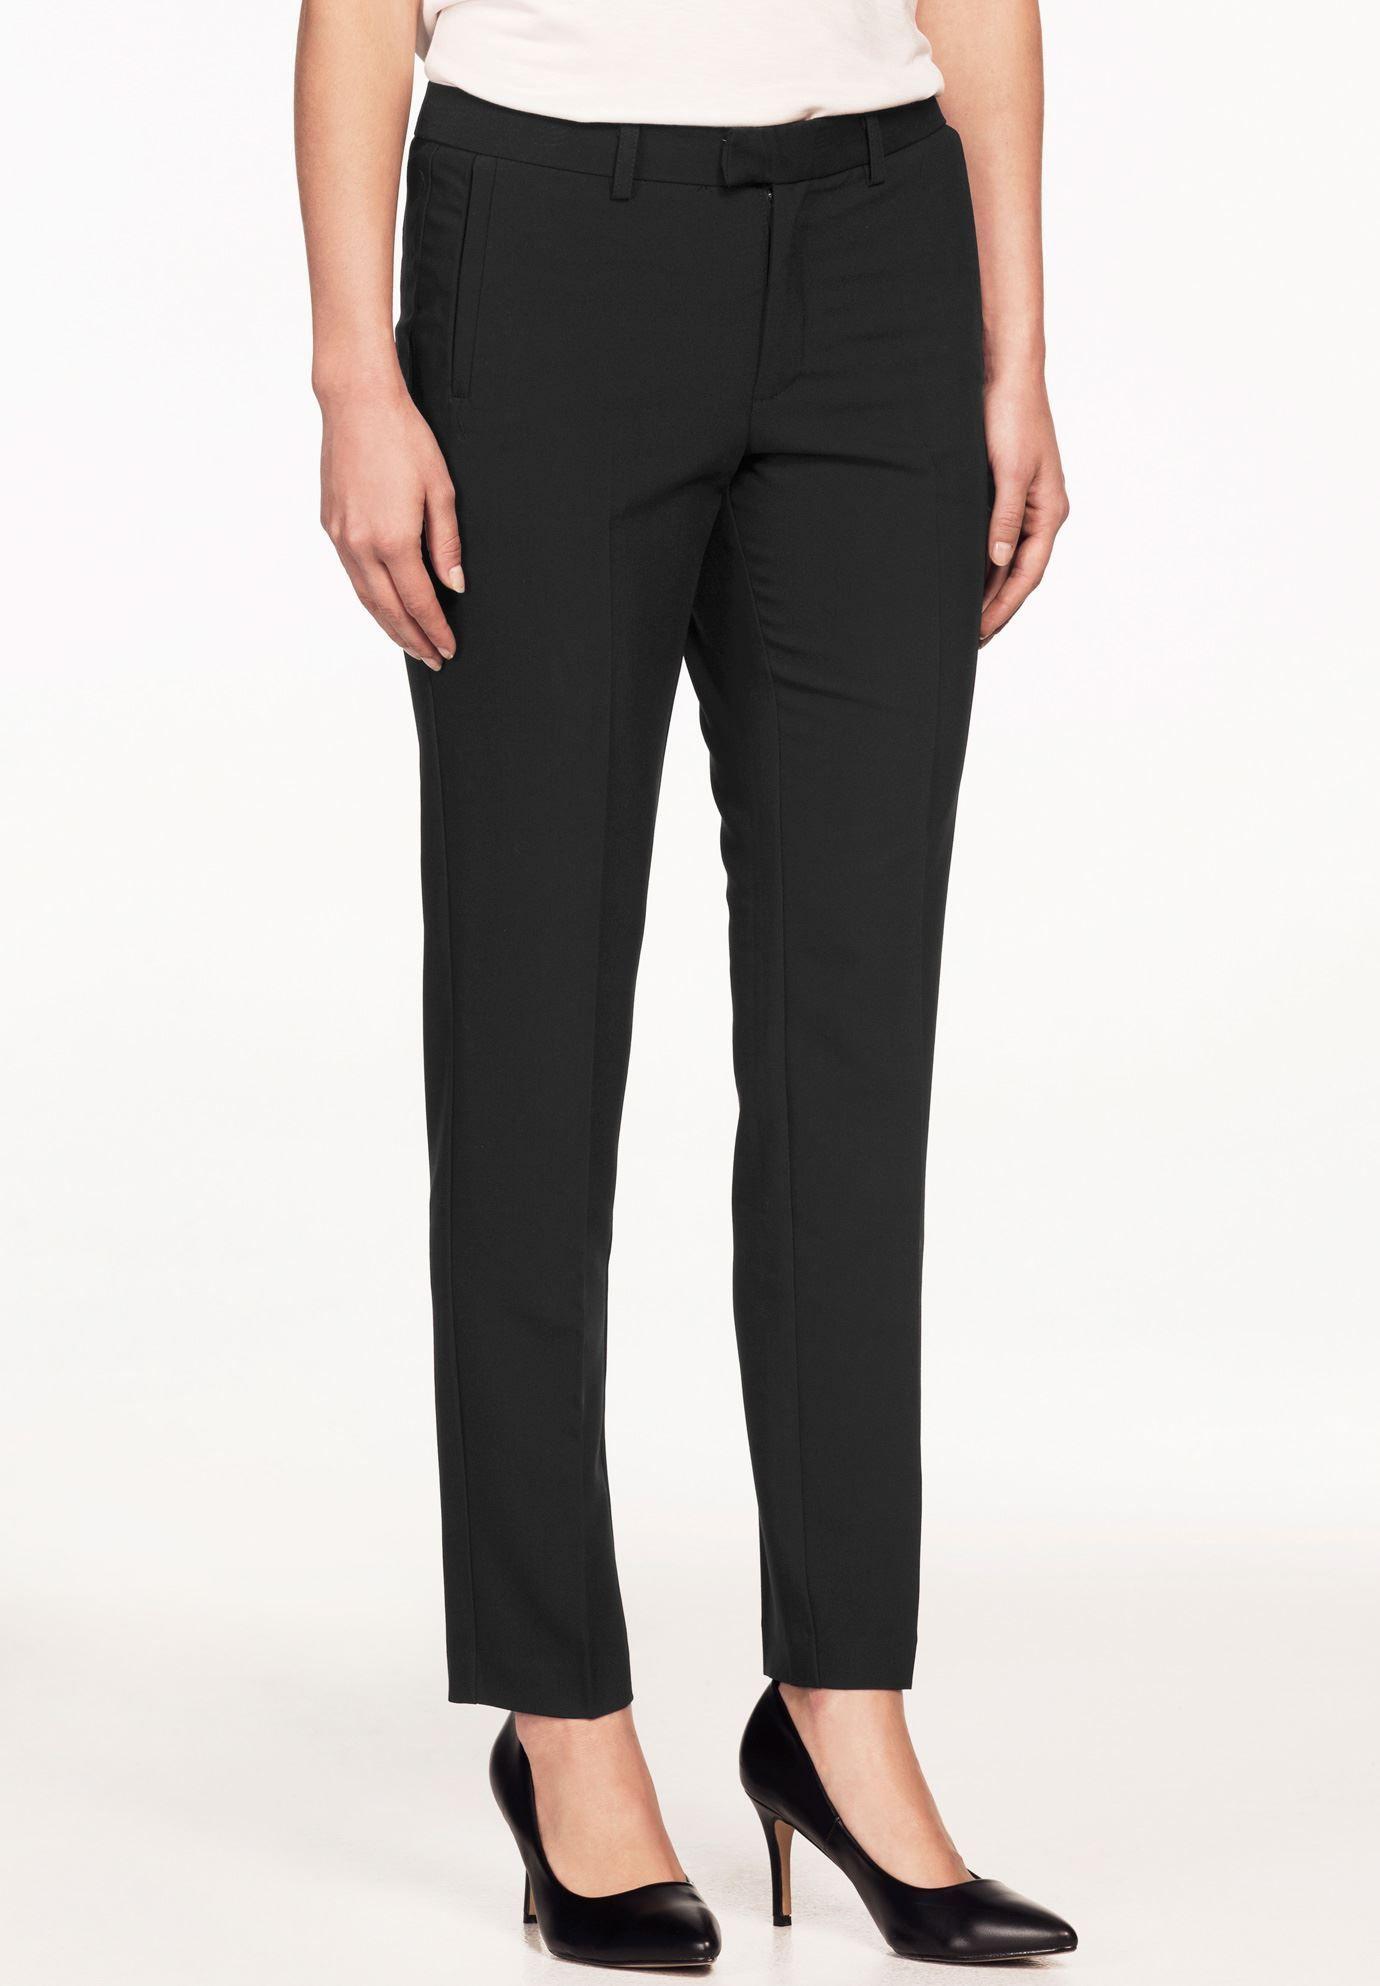 4a3350ed255b2 Everyday Slim Pants by ellos - Women s Plus Size Clothing